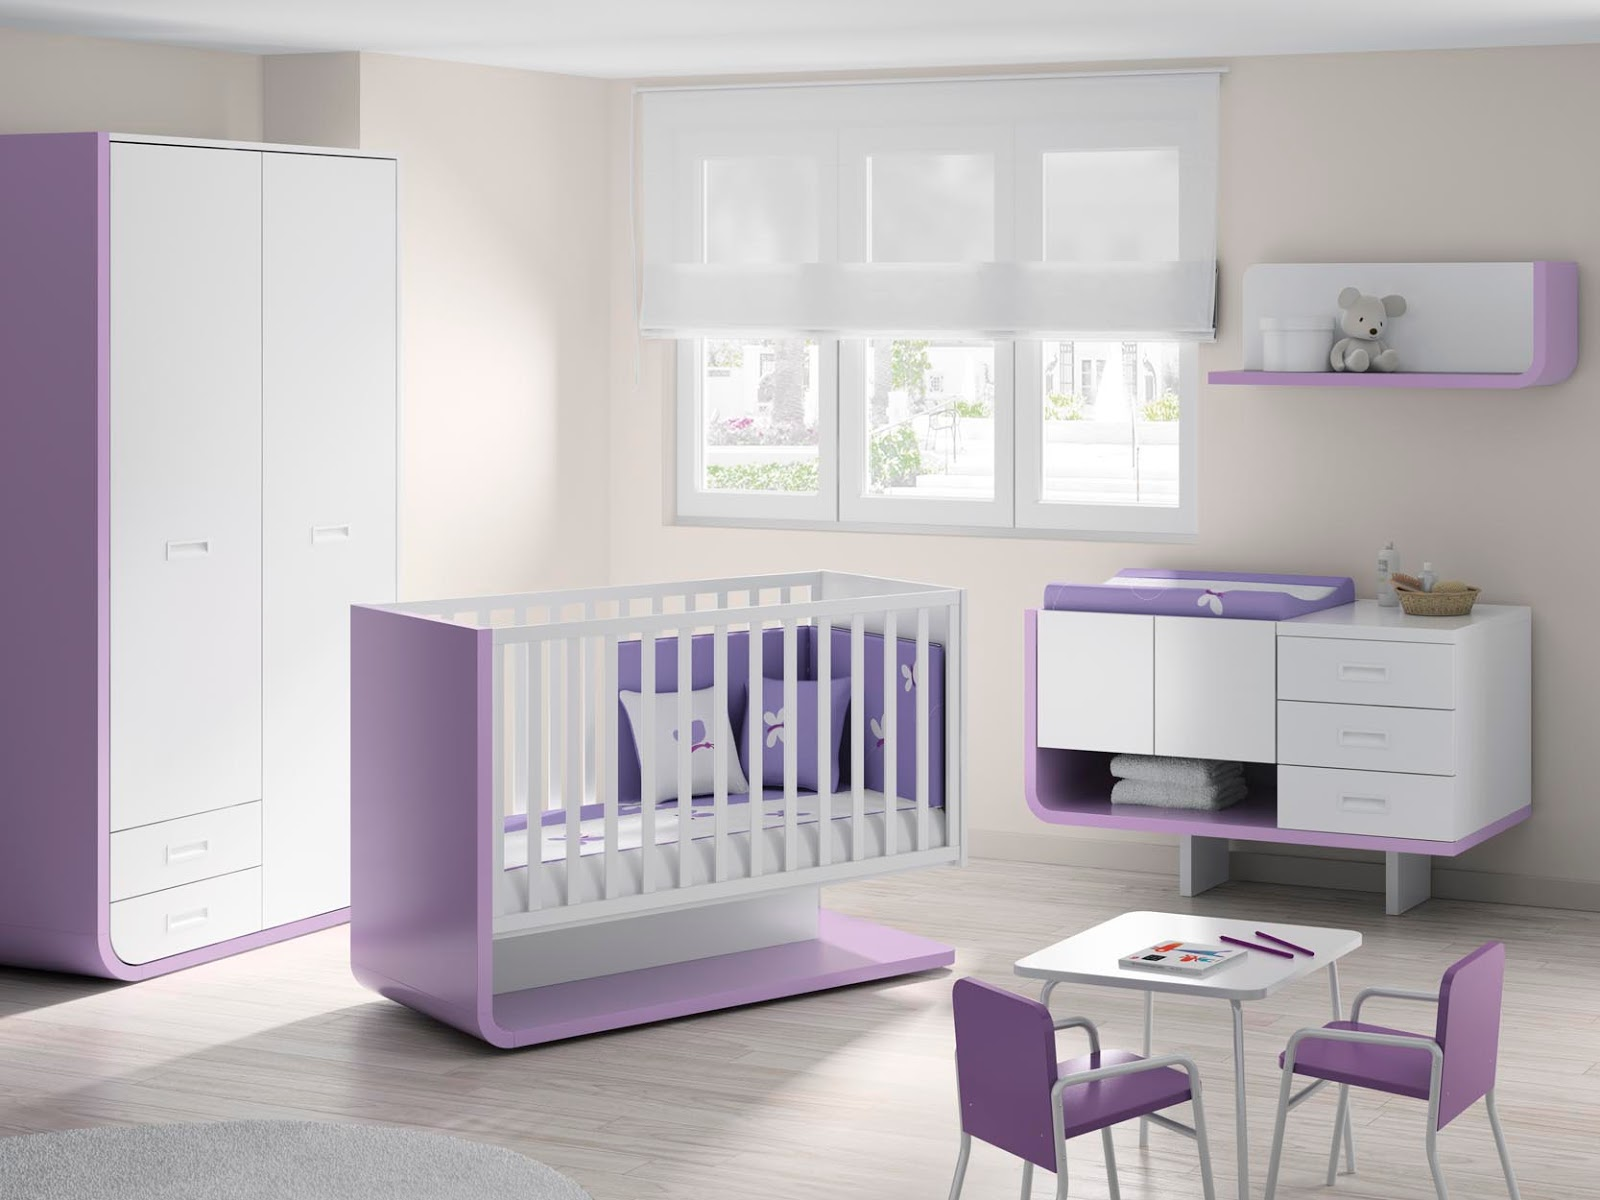 Kind und jugend 2013 linea aire for Muebles infantiles ros